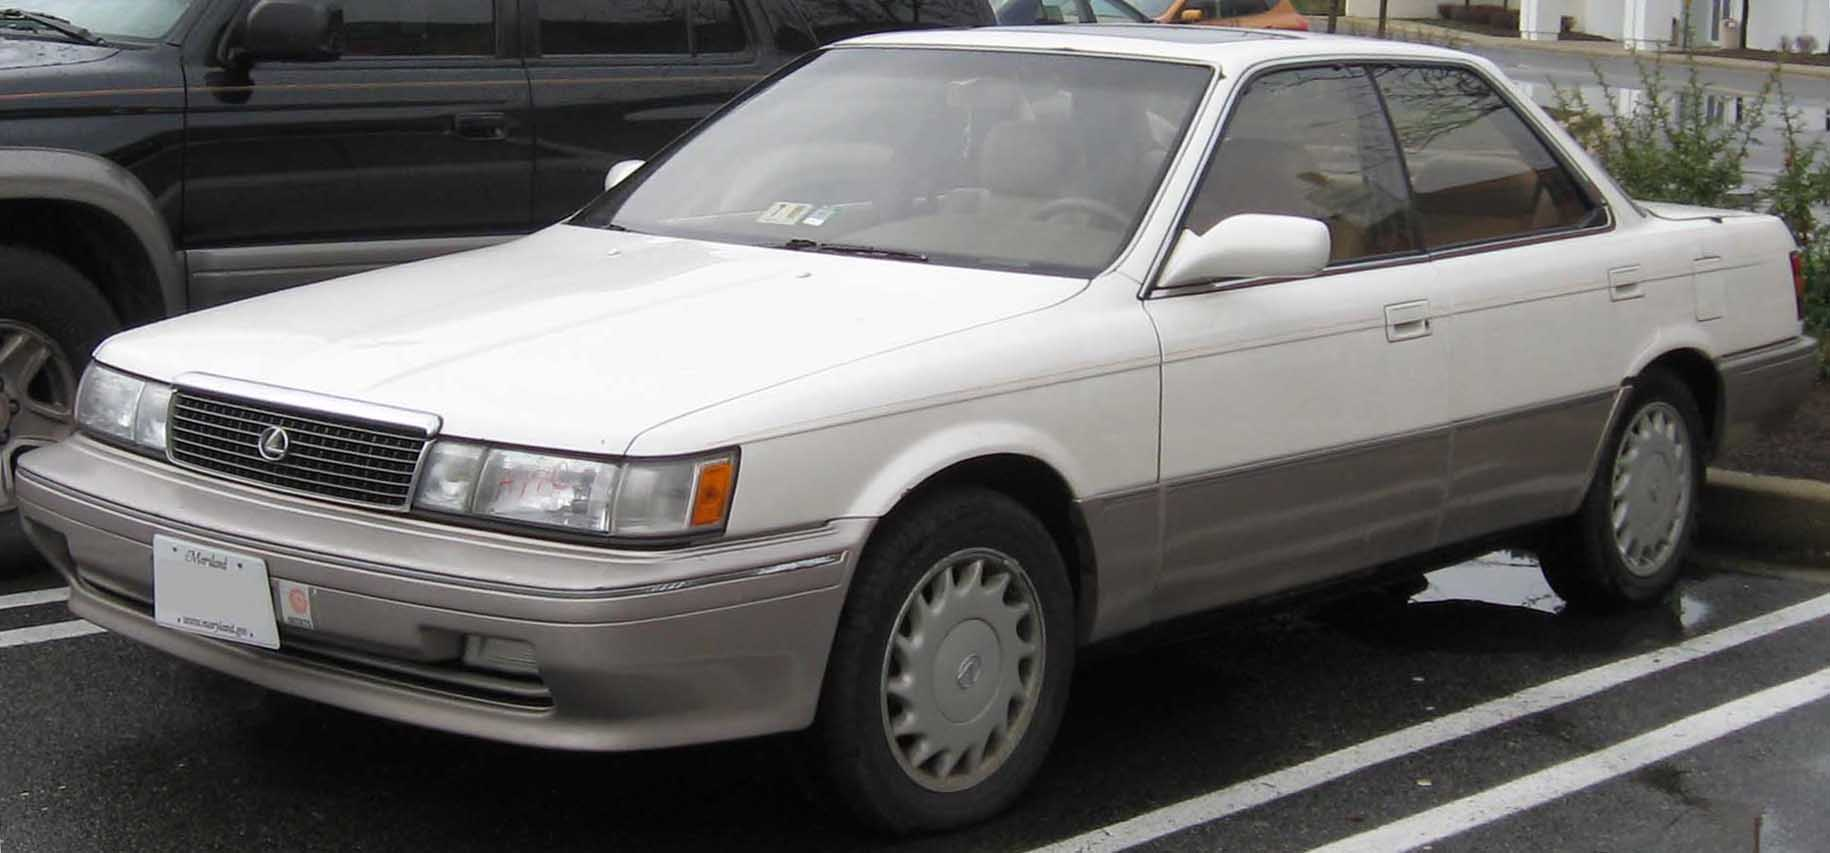 Toyota Of Waldorf >> File:Lexus ES250.jpg - Wikimedia Commons